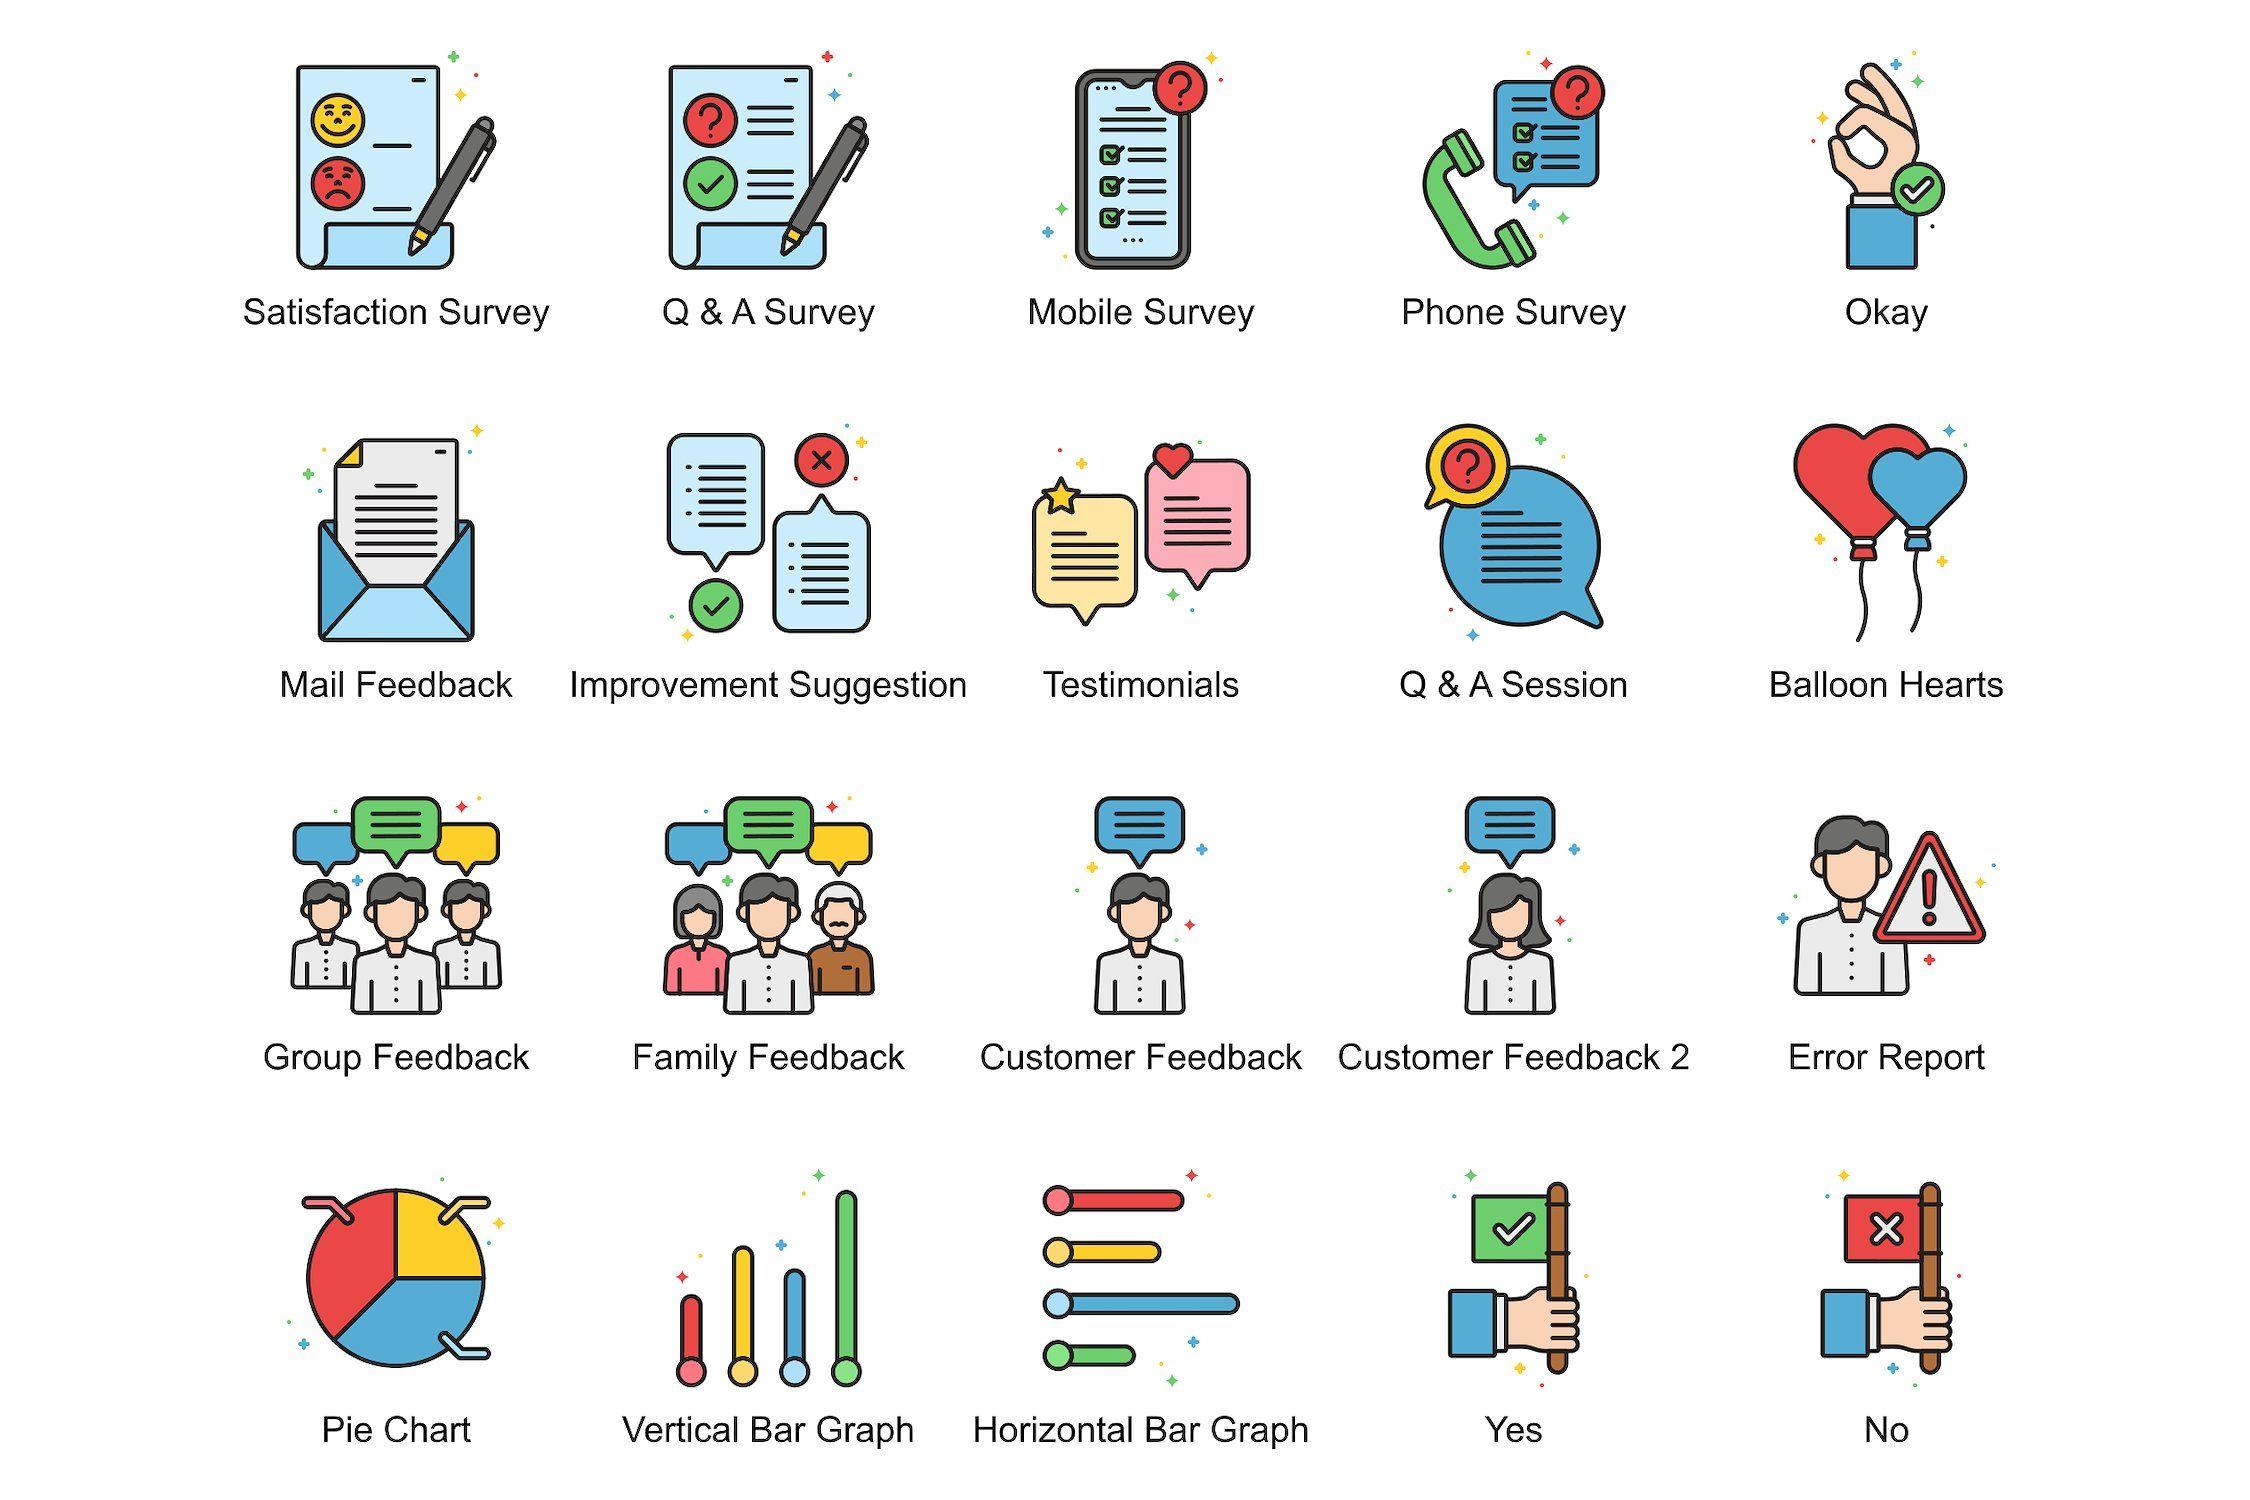 60 Customer Feedback Icons Vivid Bar Graphs Customer Feedback